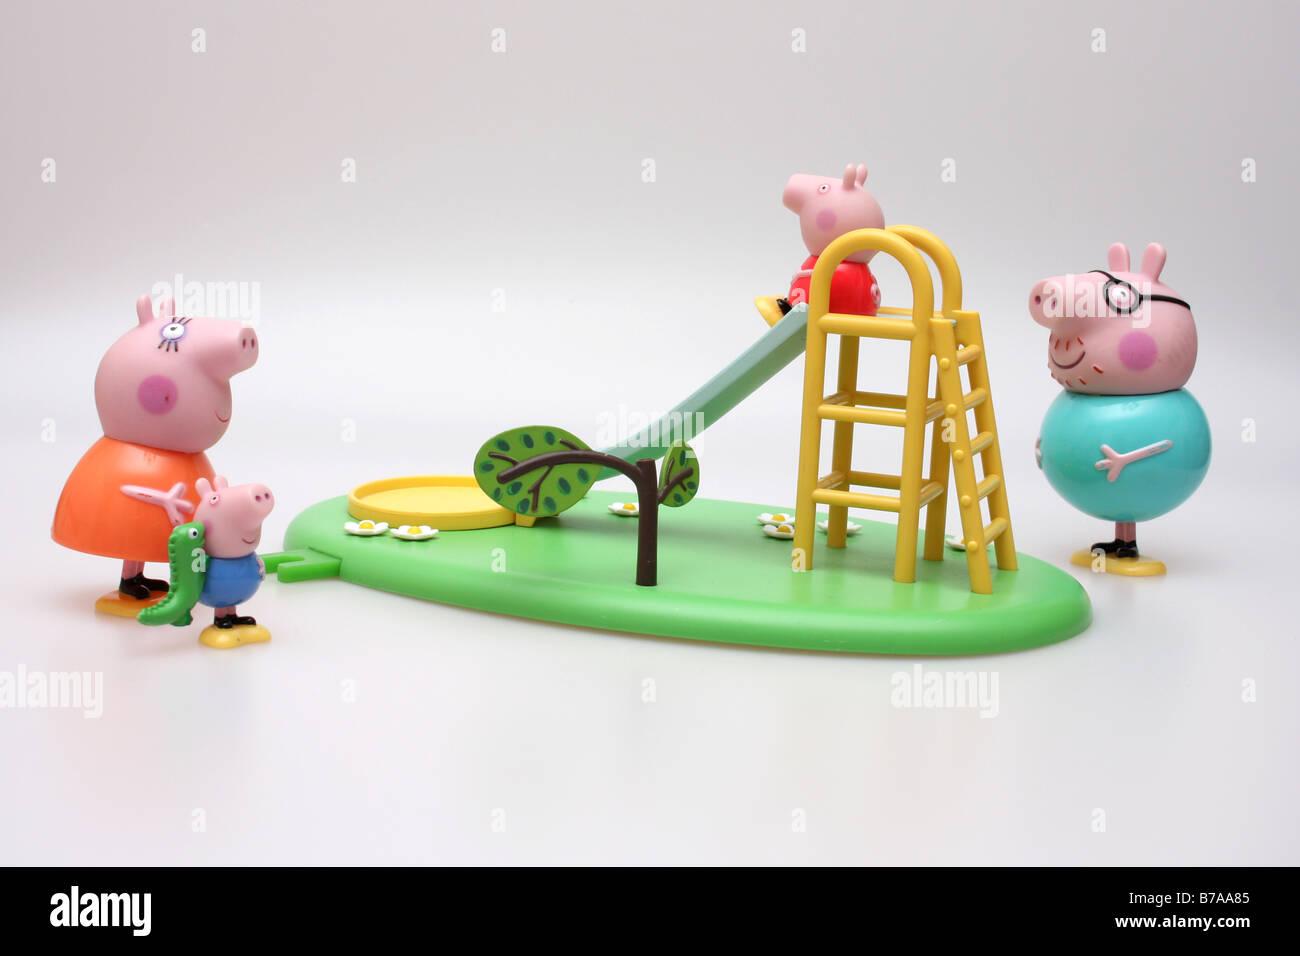 Peppa pig characters - Stock Image